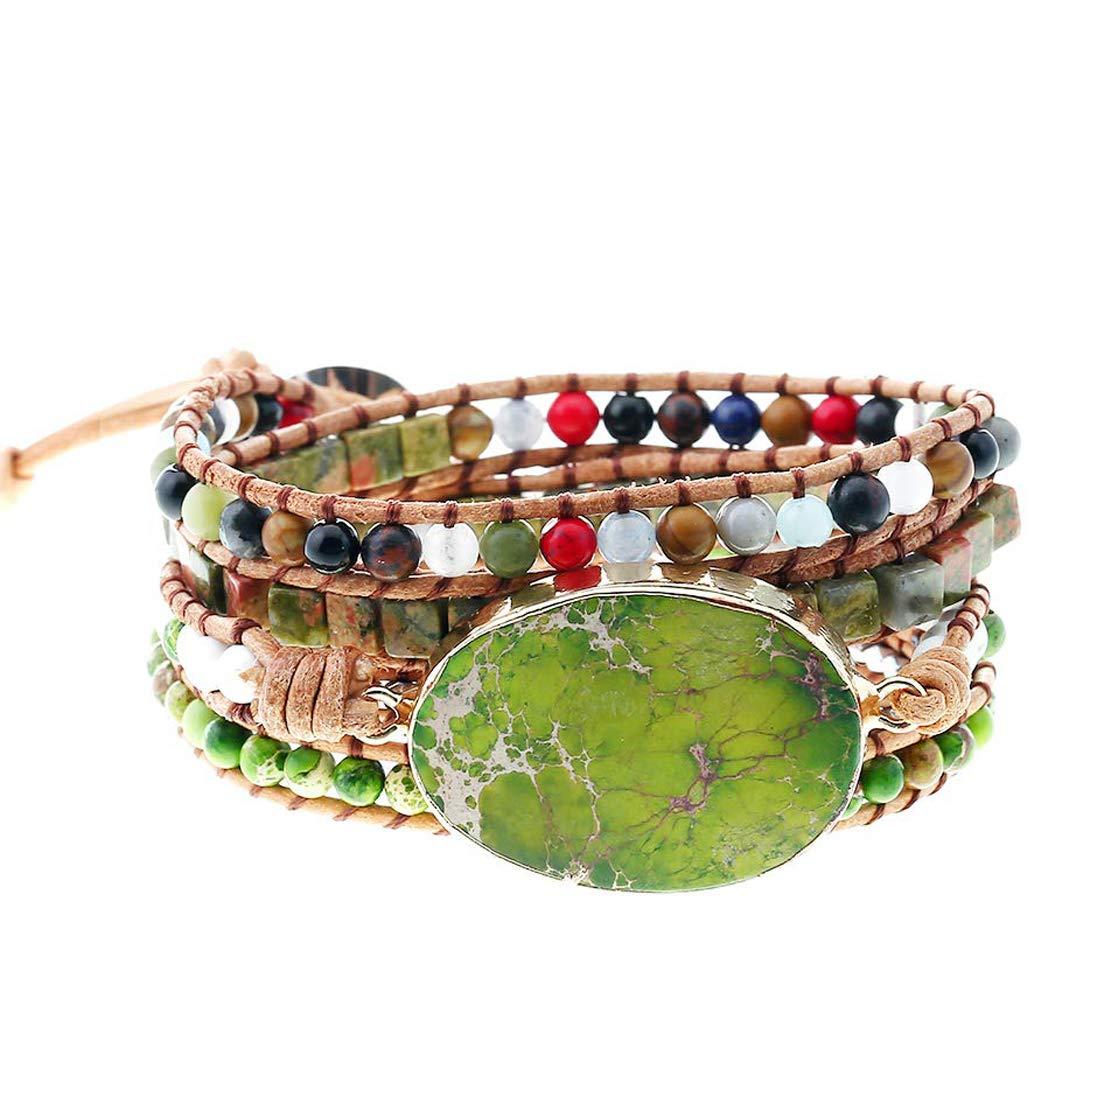 YGLINE Boho Handmade Imperial Jasper Druzy Bead 5 Wraps Statement Bracelet Jewelry Collection (Style 1) by YGLINE